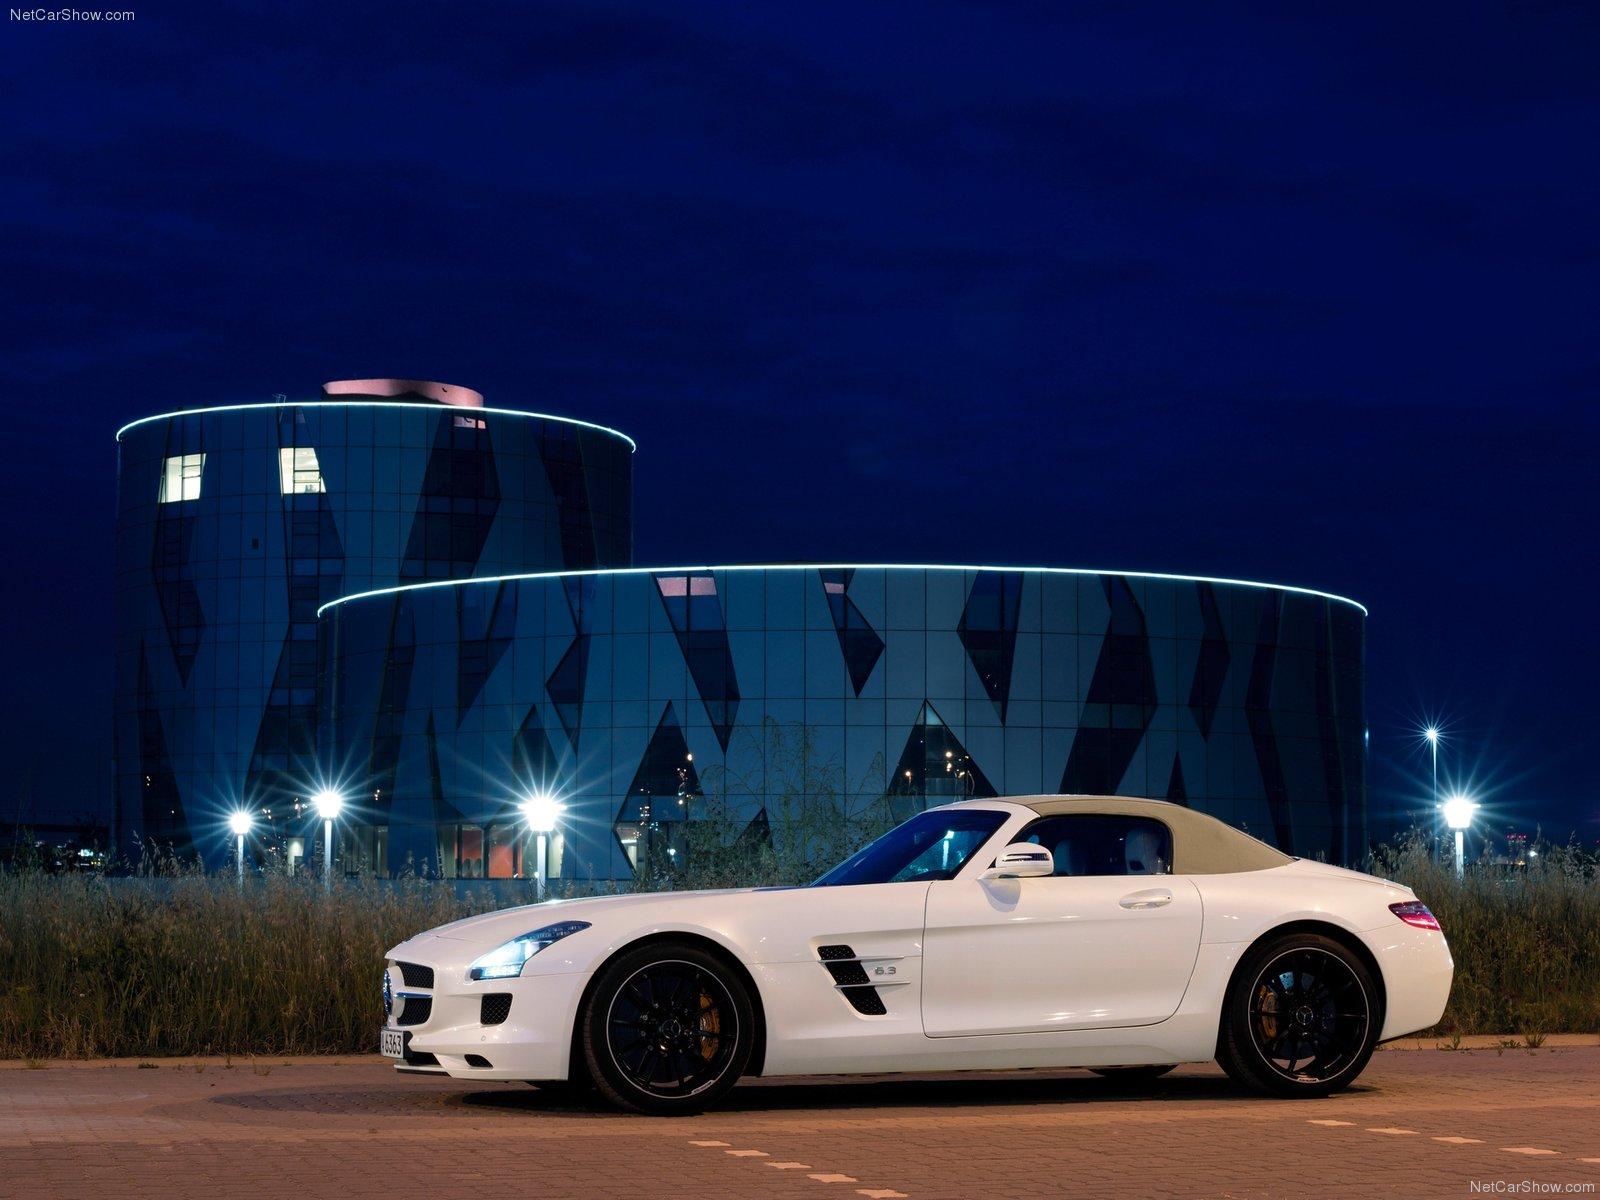 https://2.bp.blogspot.com/-YGSpsSryDBc/TeIdHKAZVAI/AAAAAAAAA8w/fIDZzTXJQZY/s1600/Mercedes-Benz-SLS_AMG_Roadster_2012_1600x1200_wallpaper_0c.jpg